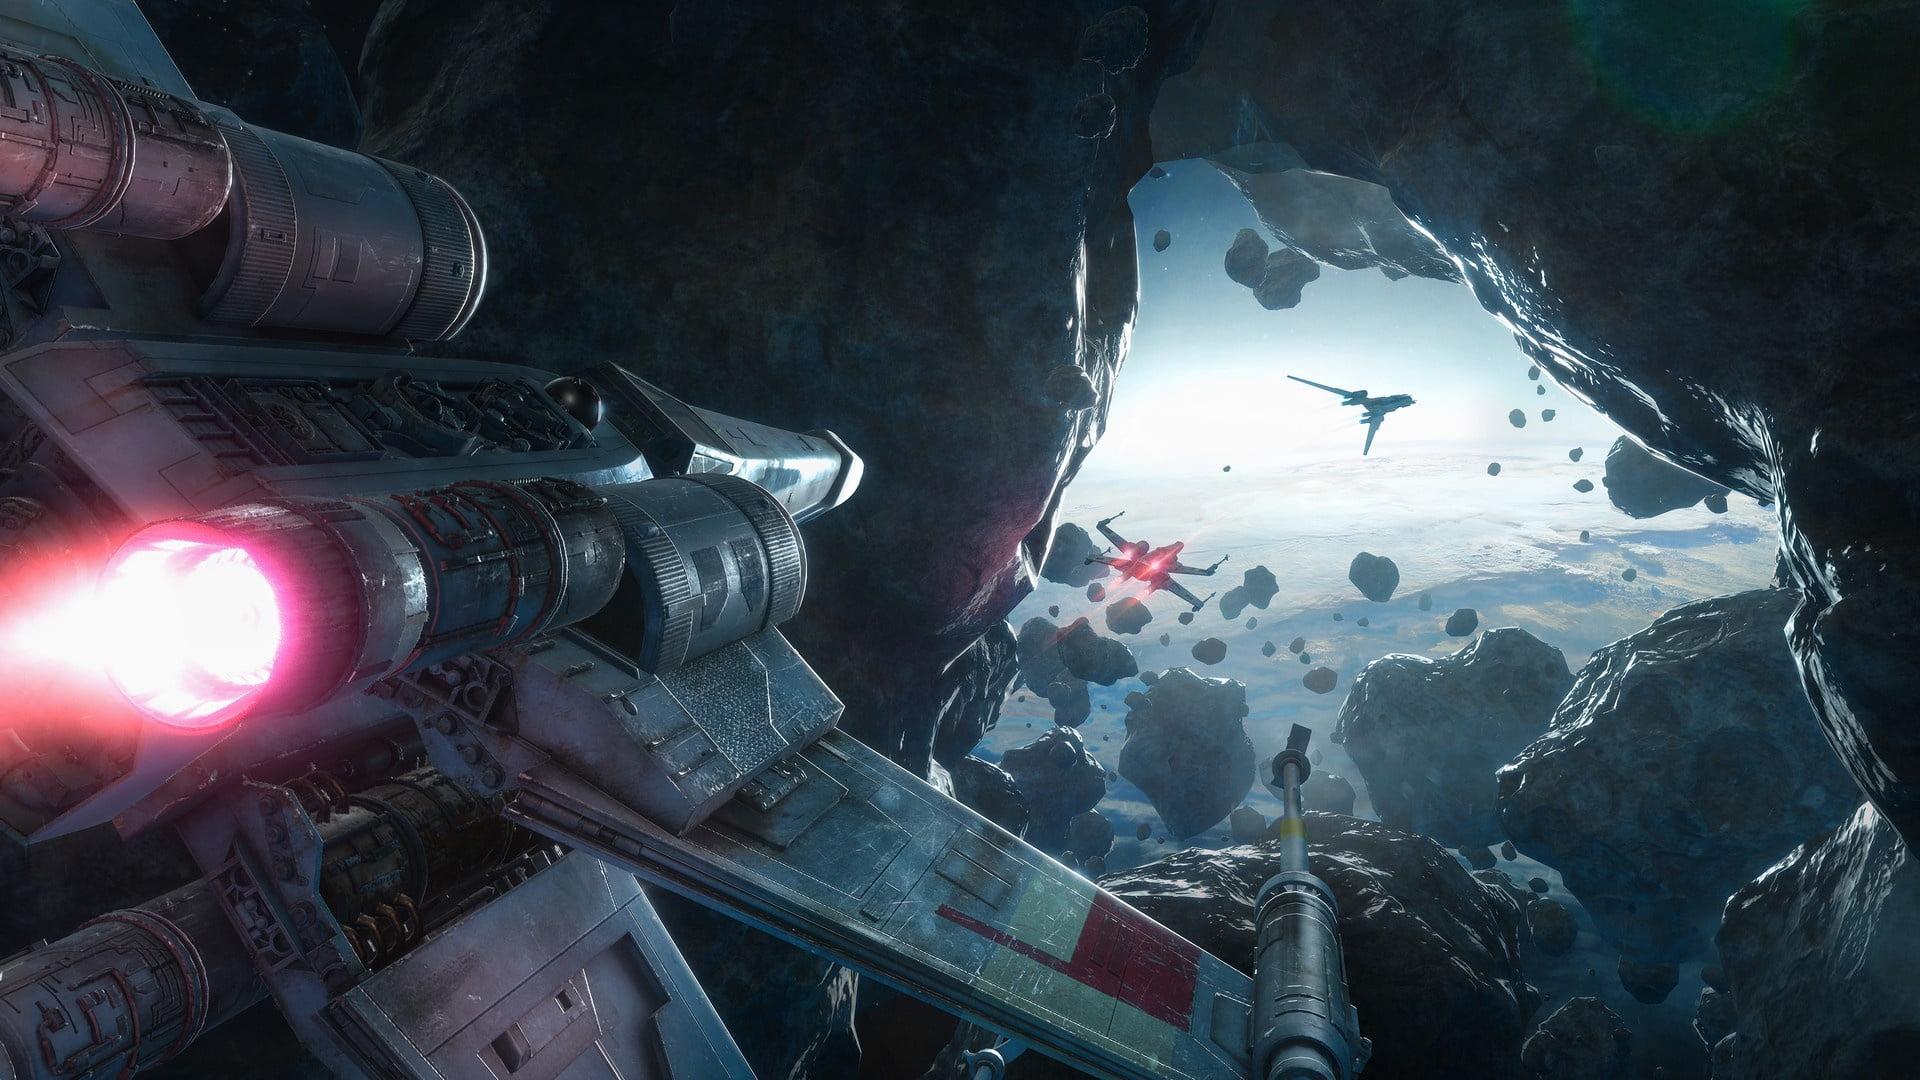 Aircraft Digital Wallpaper, Star Wars, Science Fiction, - Star Wars X Wing Rogue One , HD Wallpaper & Backgrounds